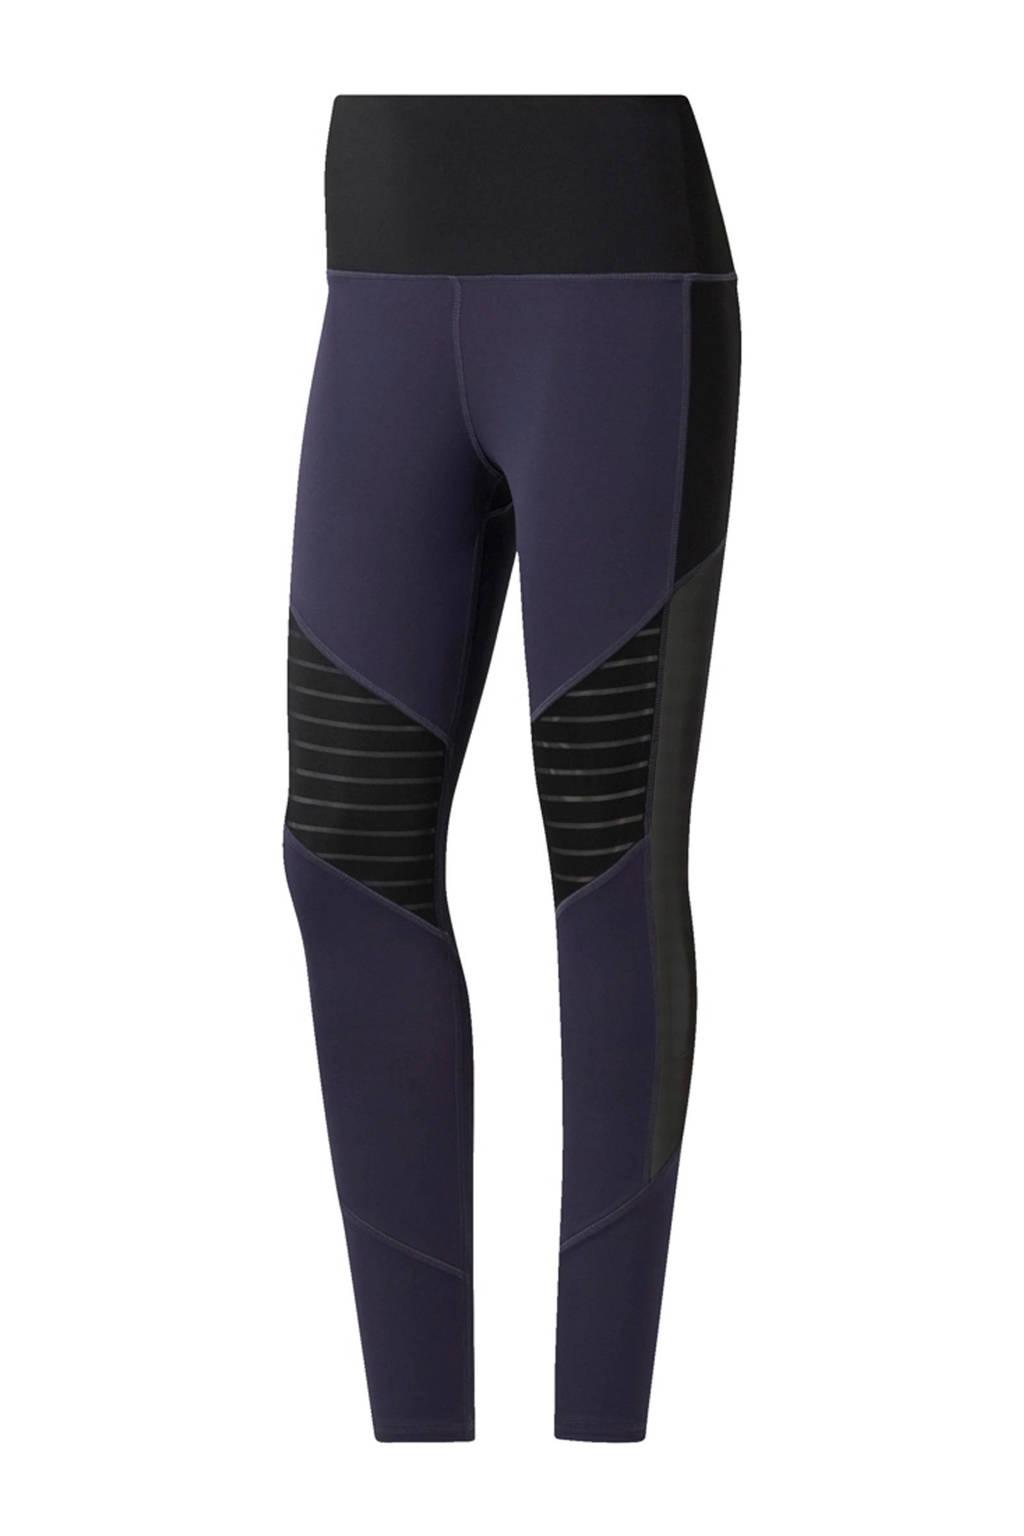 Reebok sportbroek donkerblauw, Donkerblauw/zwart